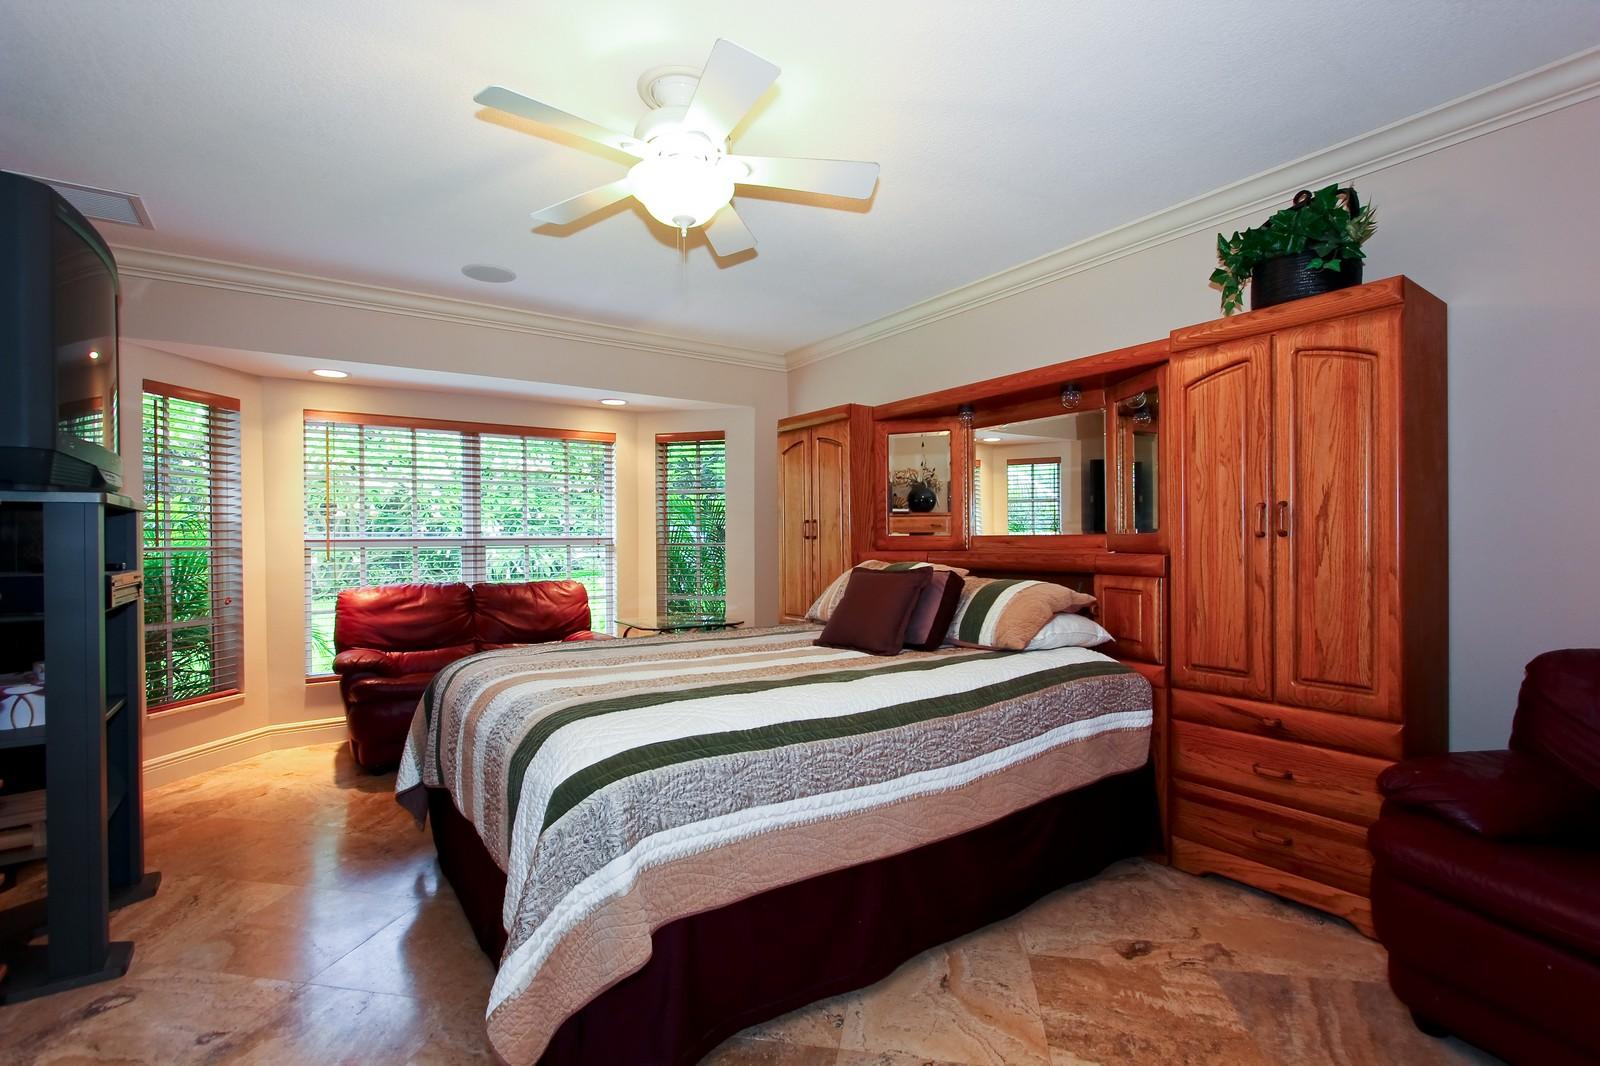 Real Estate Photography - 430 N. Lyra Circle, Juno Beach, FL, 33408 - Bedroom